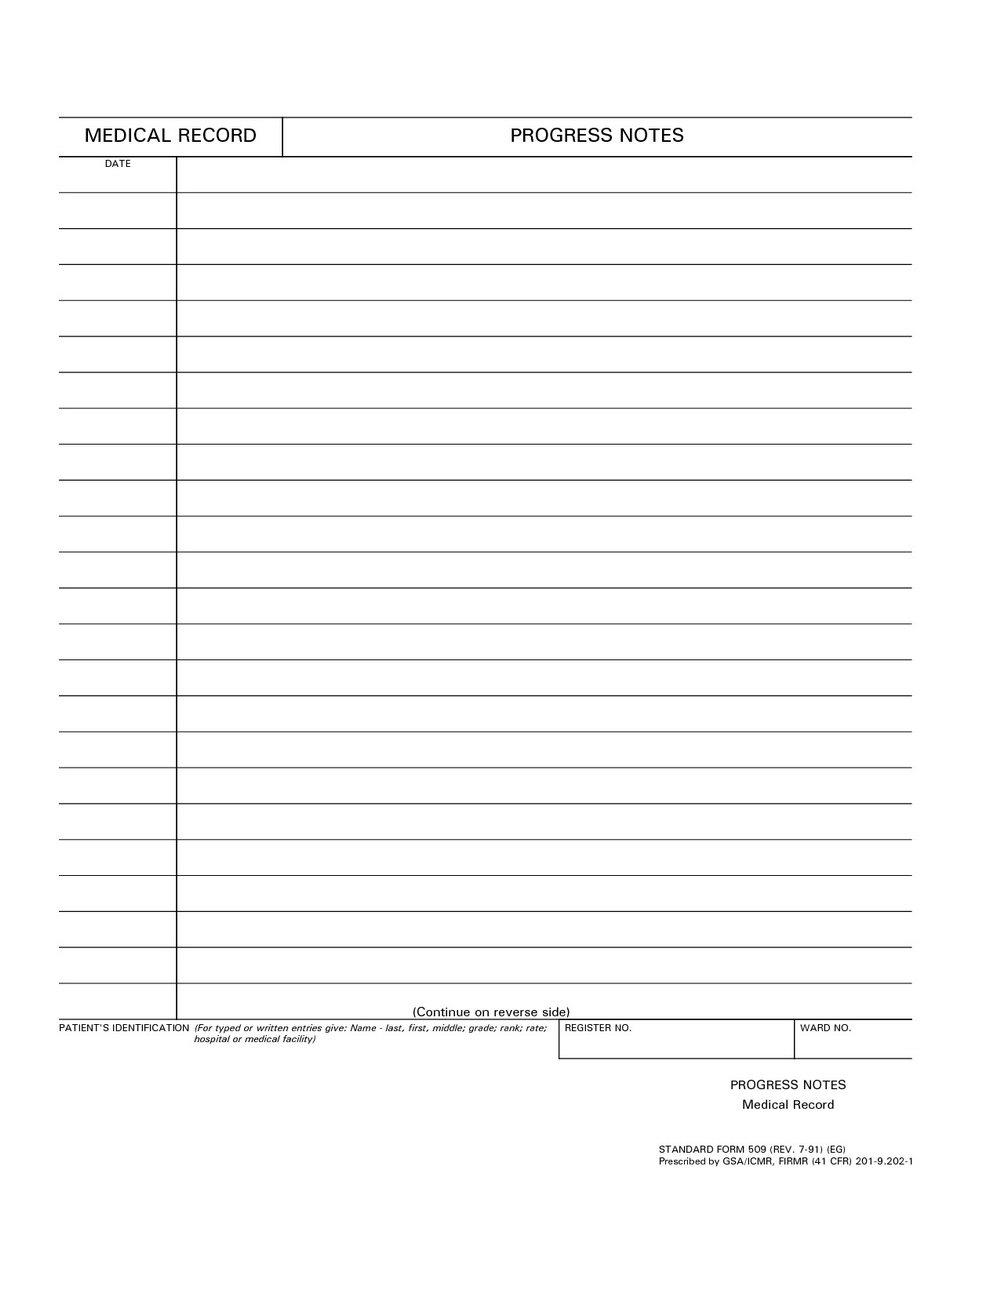 Progress Notes Template